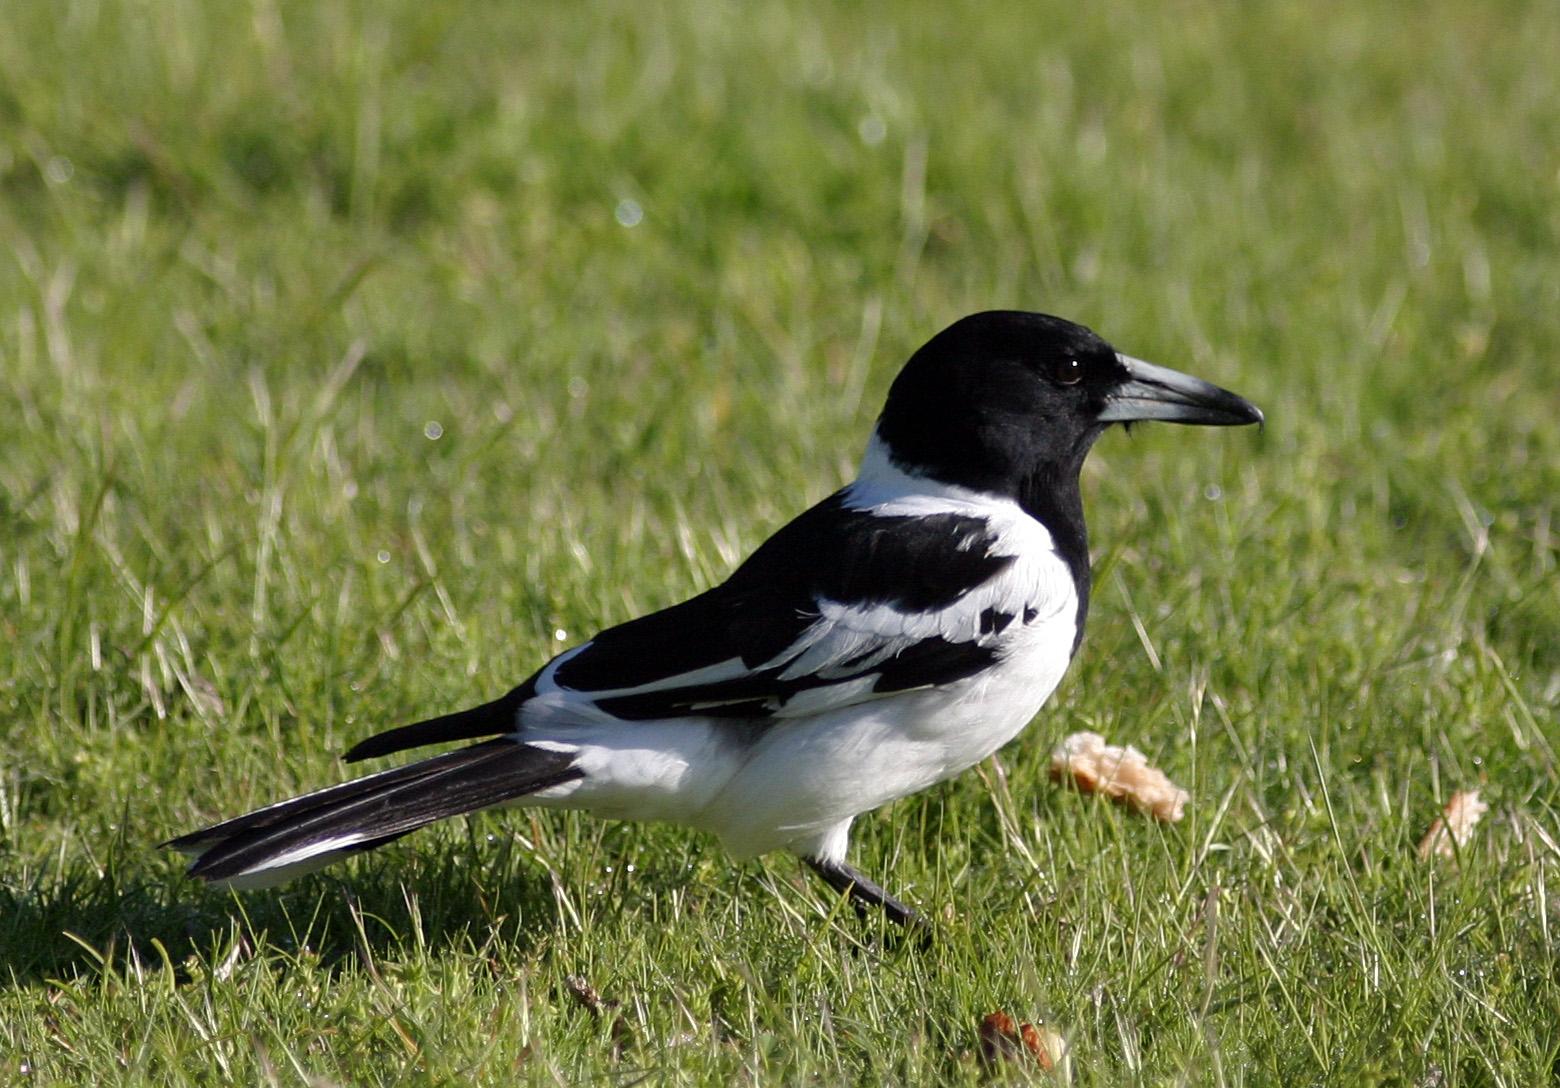 BirdLife Melbourne - Pied Butcherbird